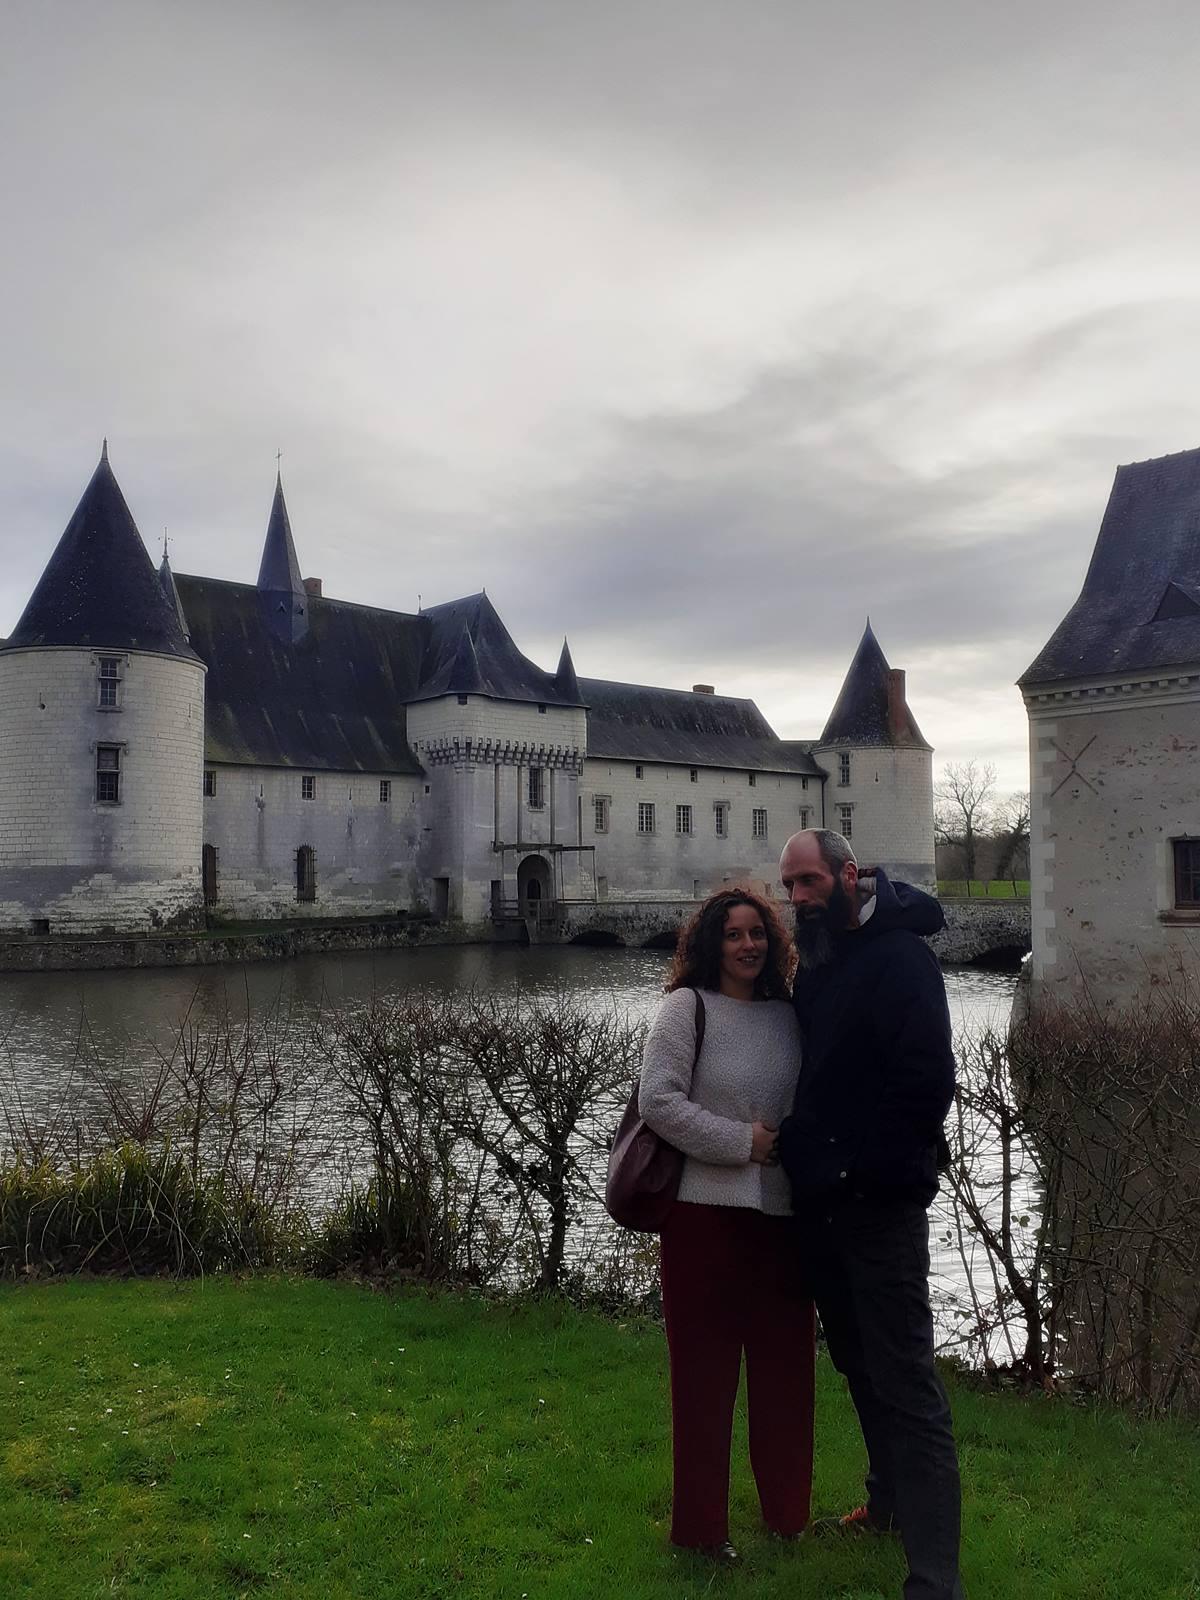 Chateau plessis bourre maine loire tourisme20200222 170356